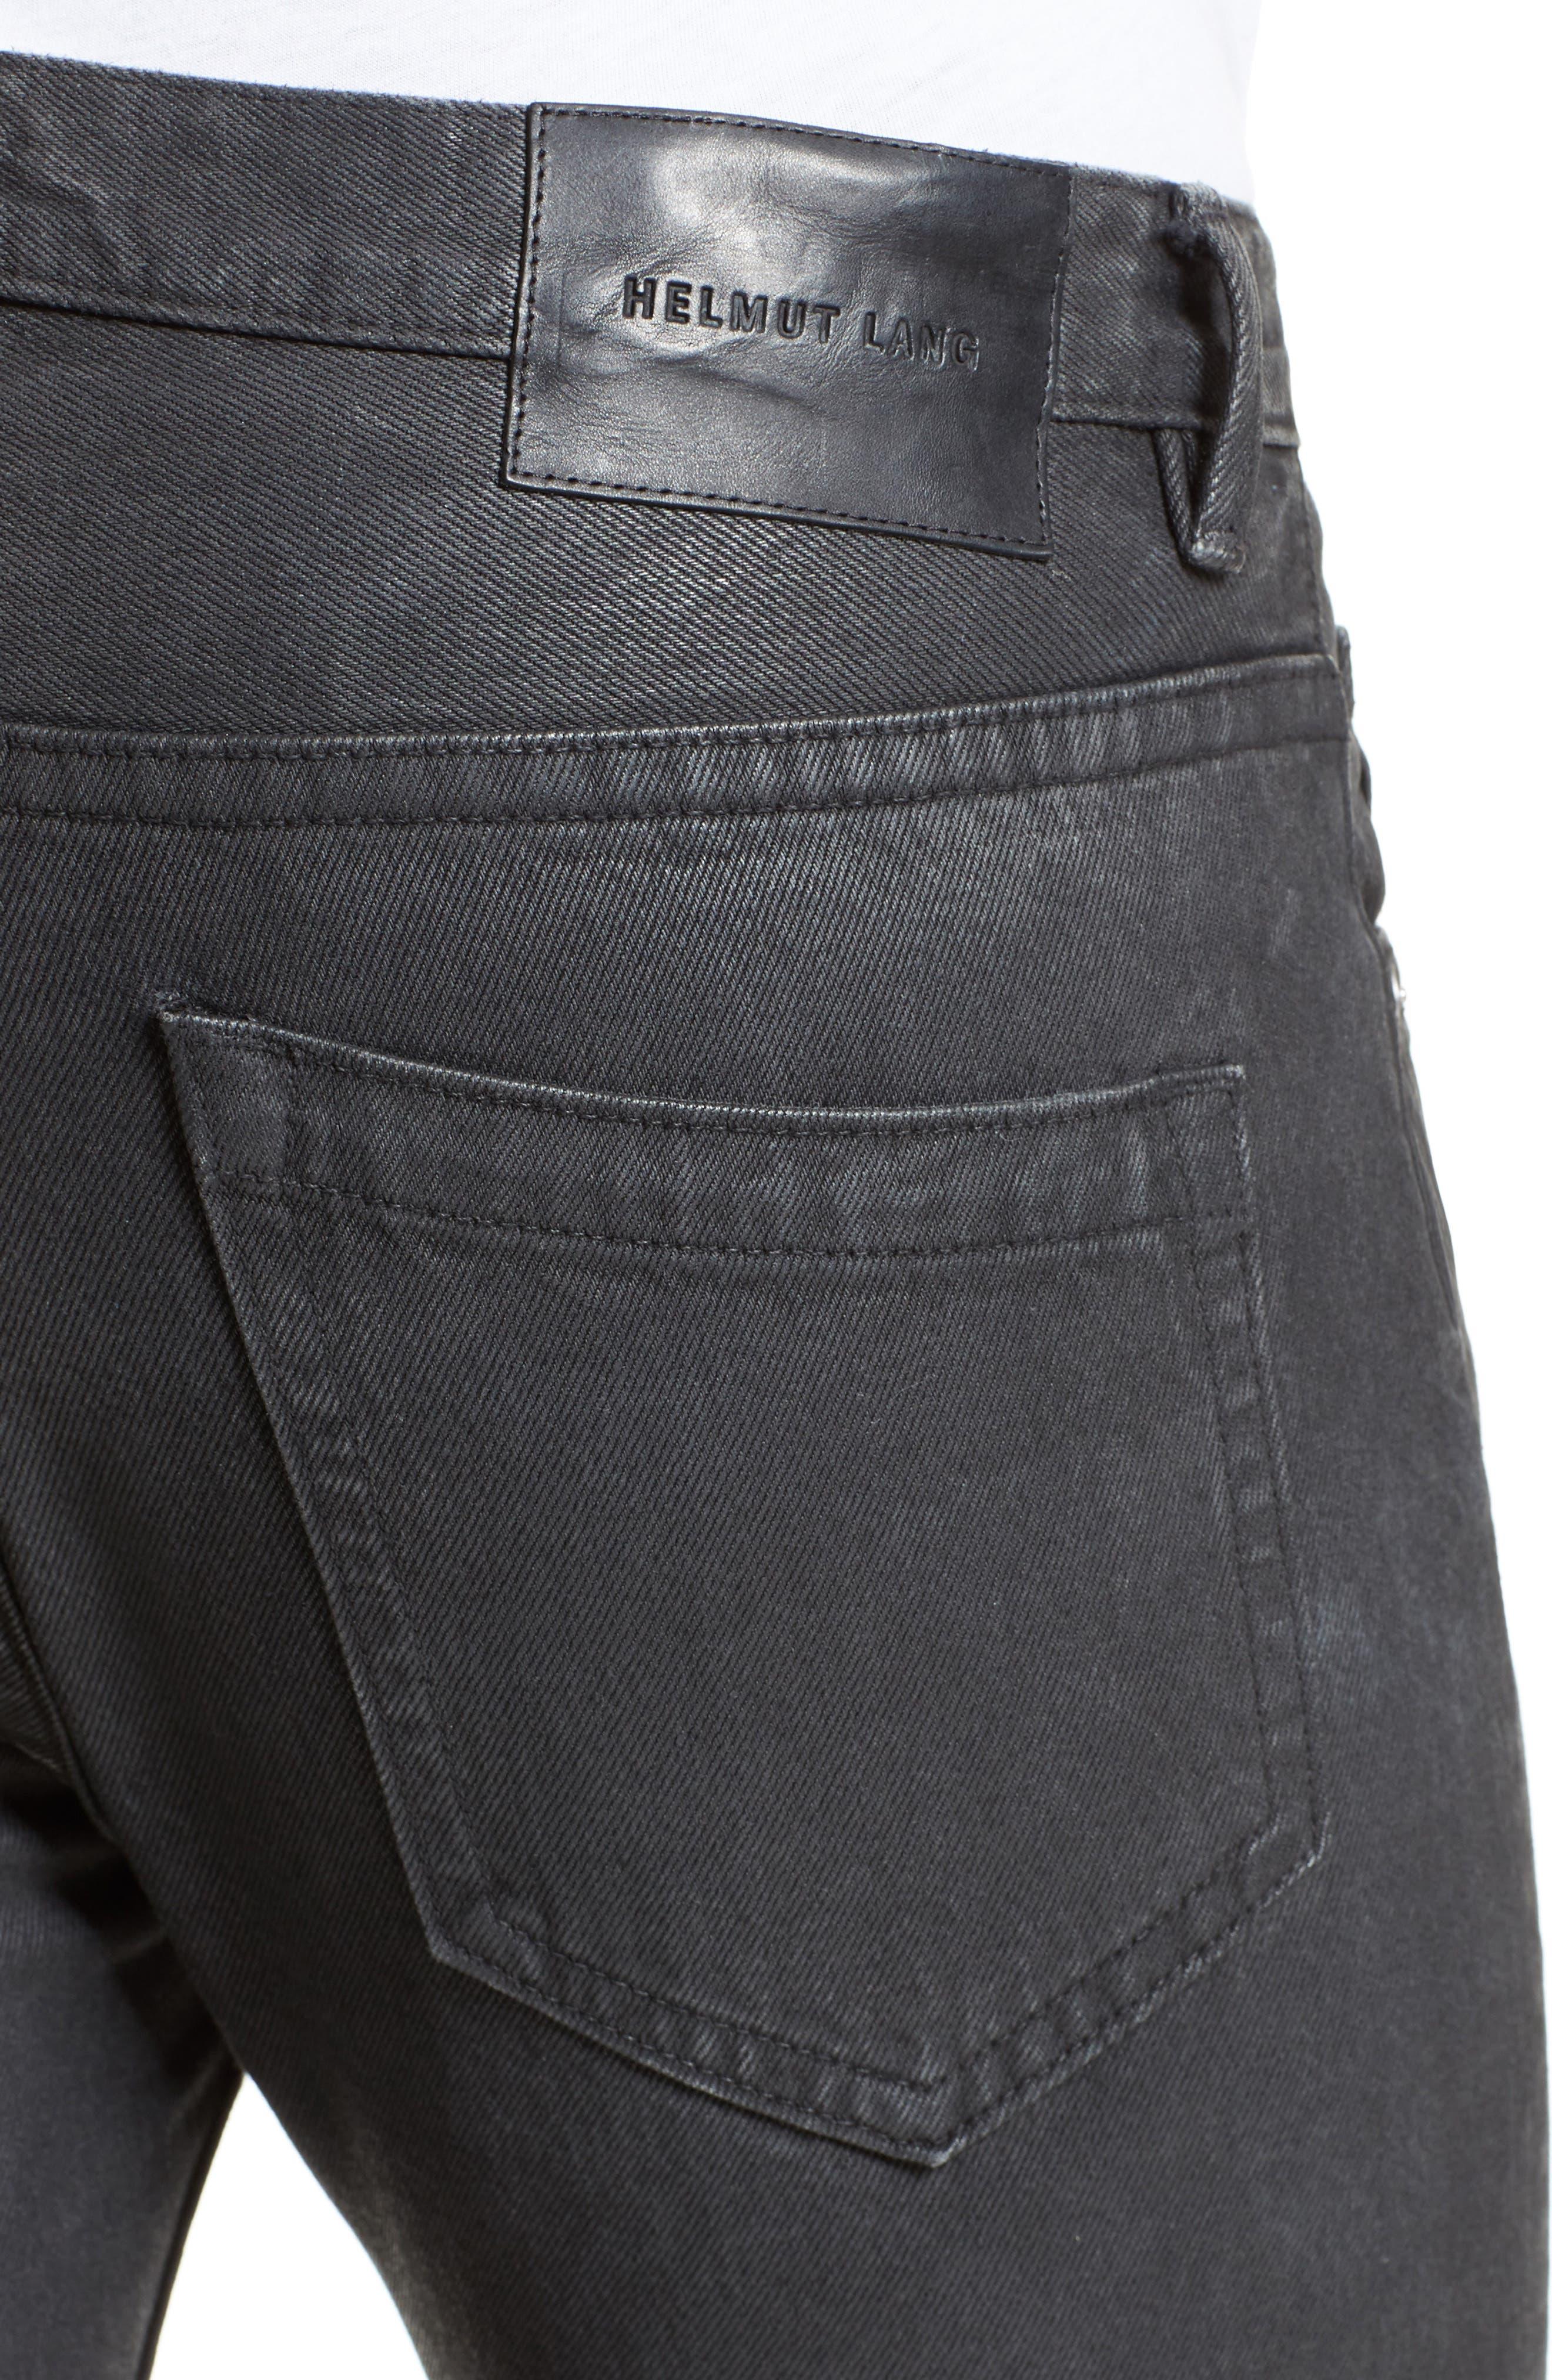 MR 87 Jeans,                             Alternate thumbnail 4, color,                             006